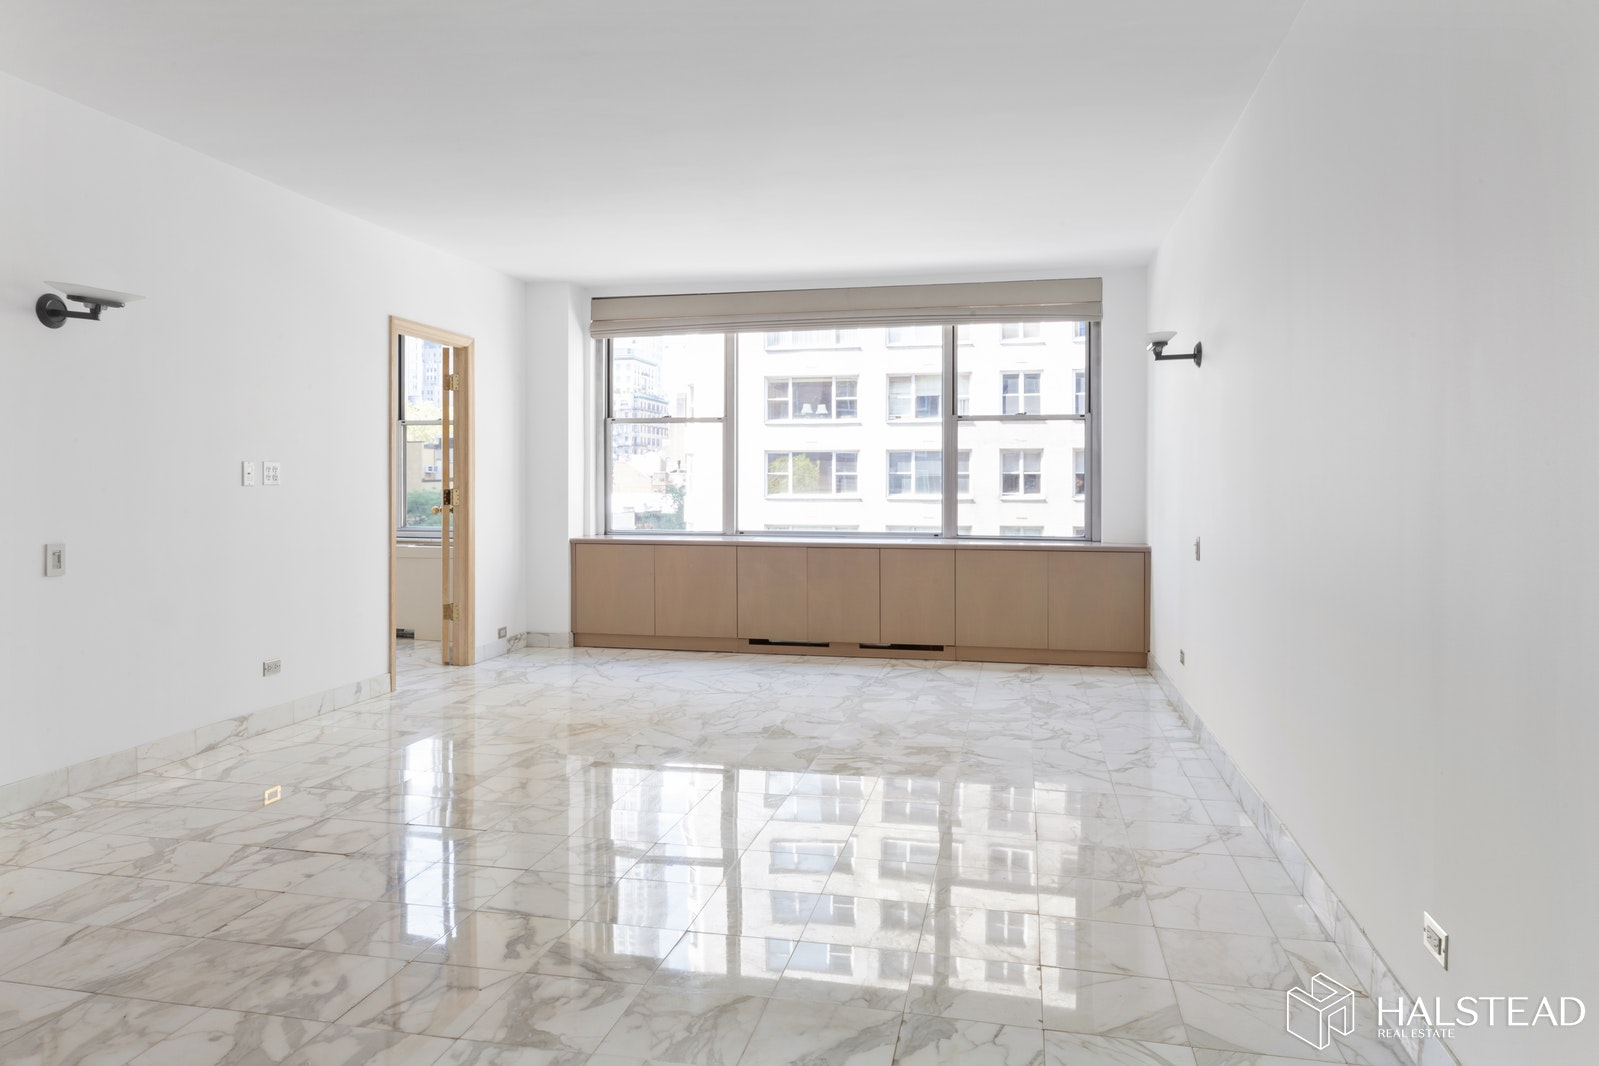 UPPER EAST SIDE 2 BED 2 BATH, Upper East Side, $1,200,000, Web #: 19892674